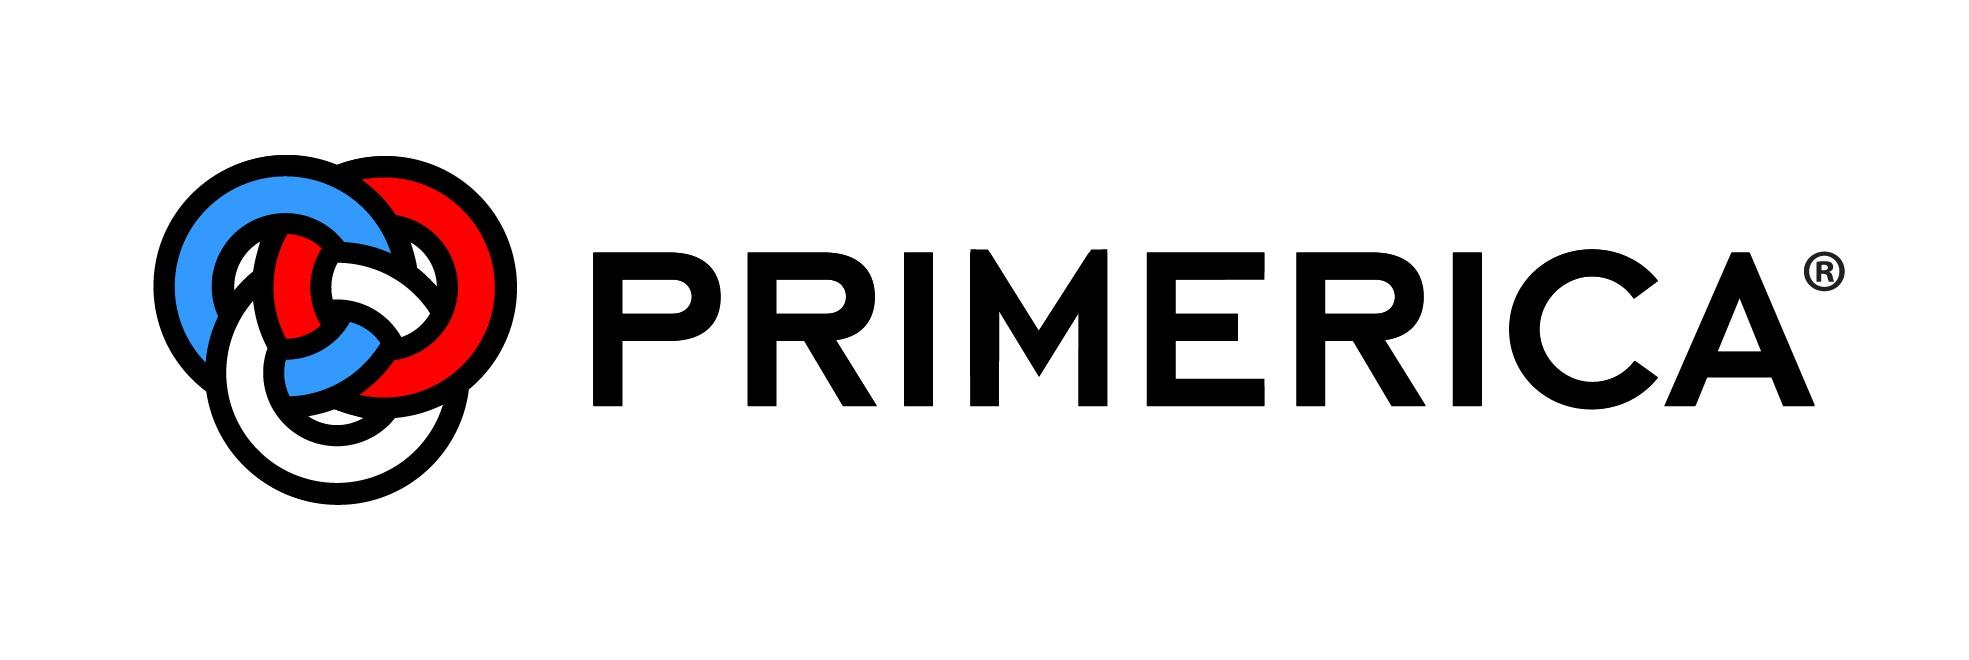 primerica-logo ad